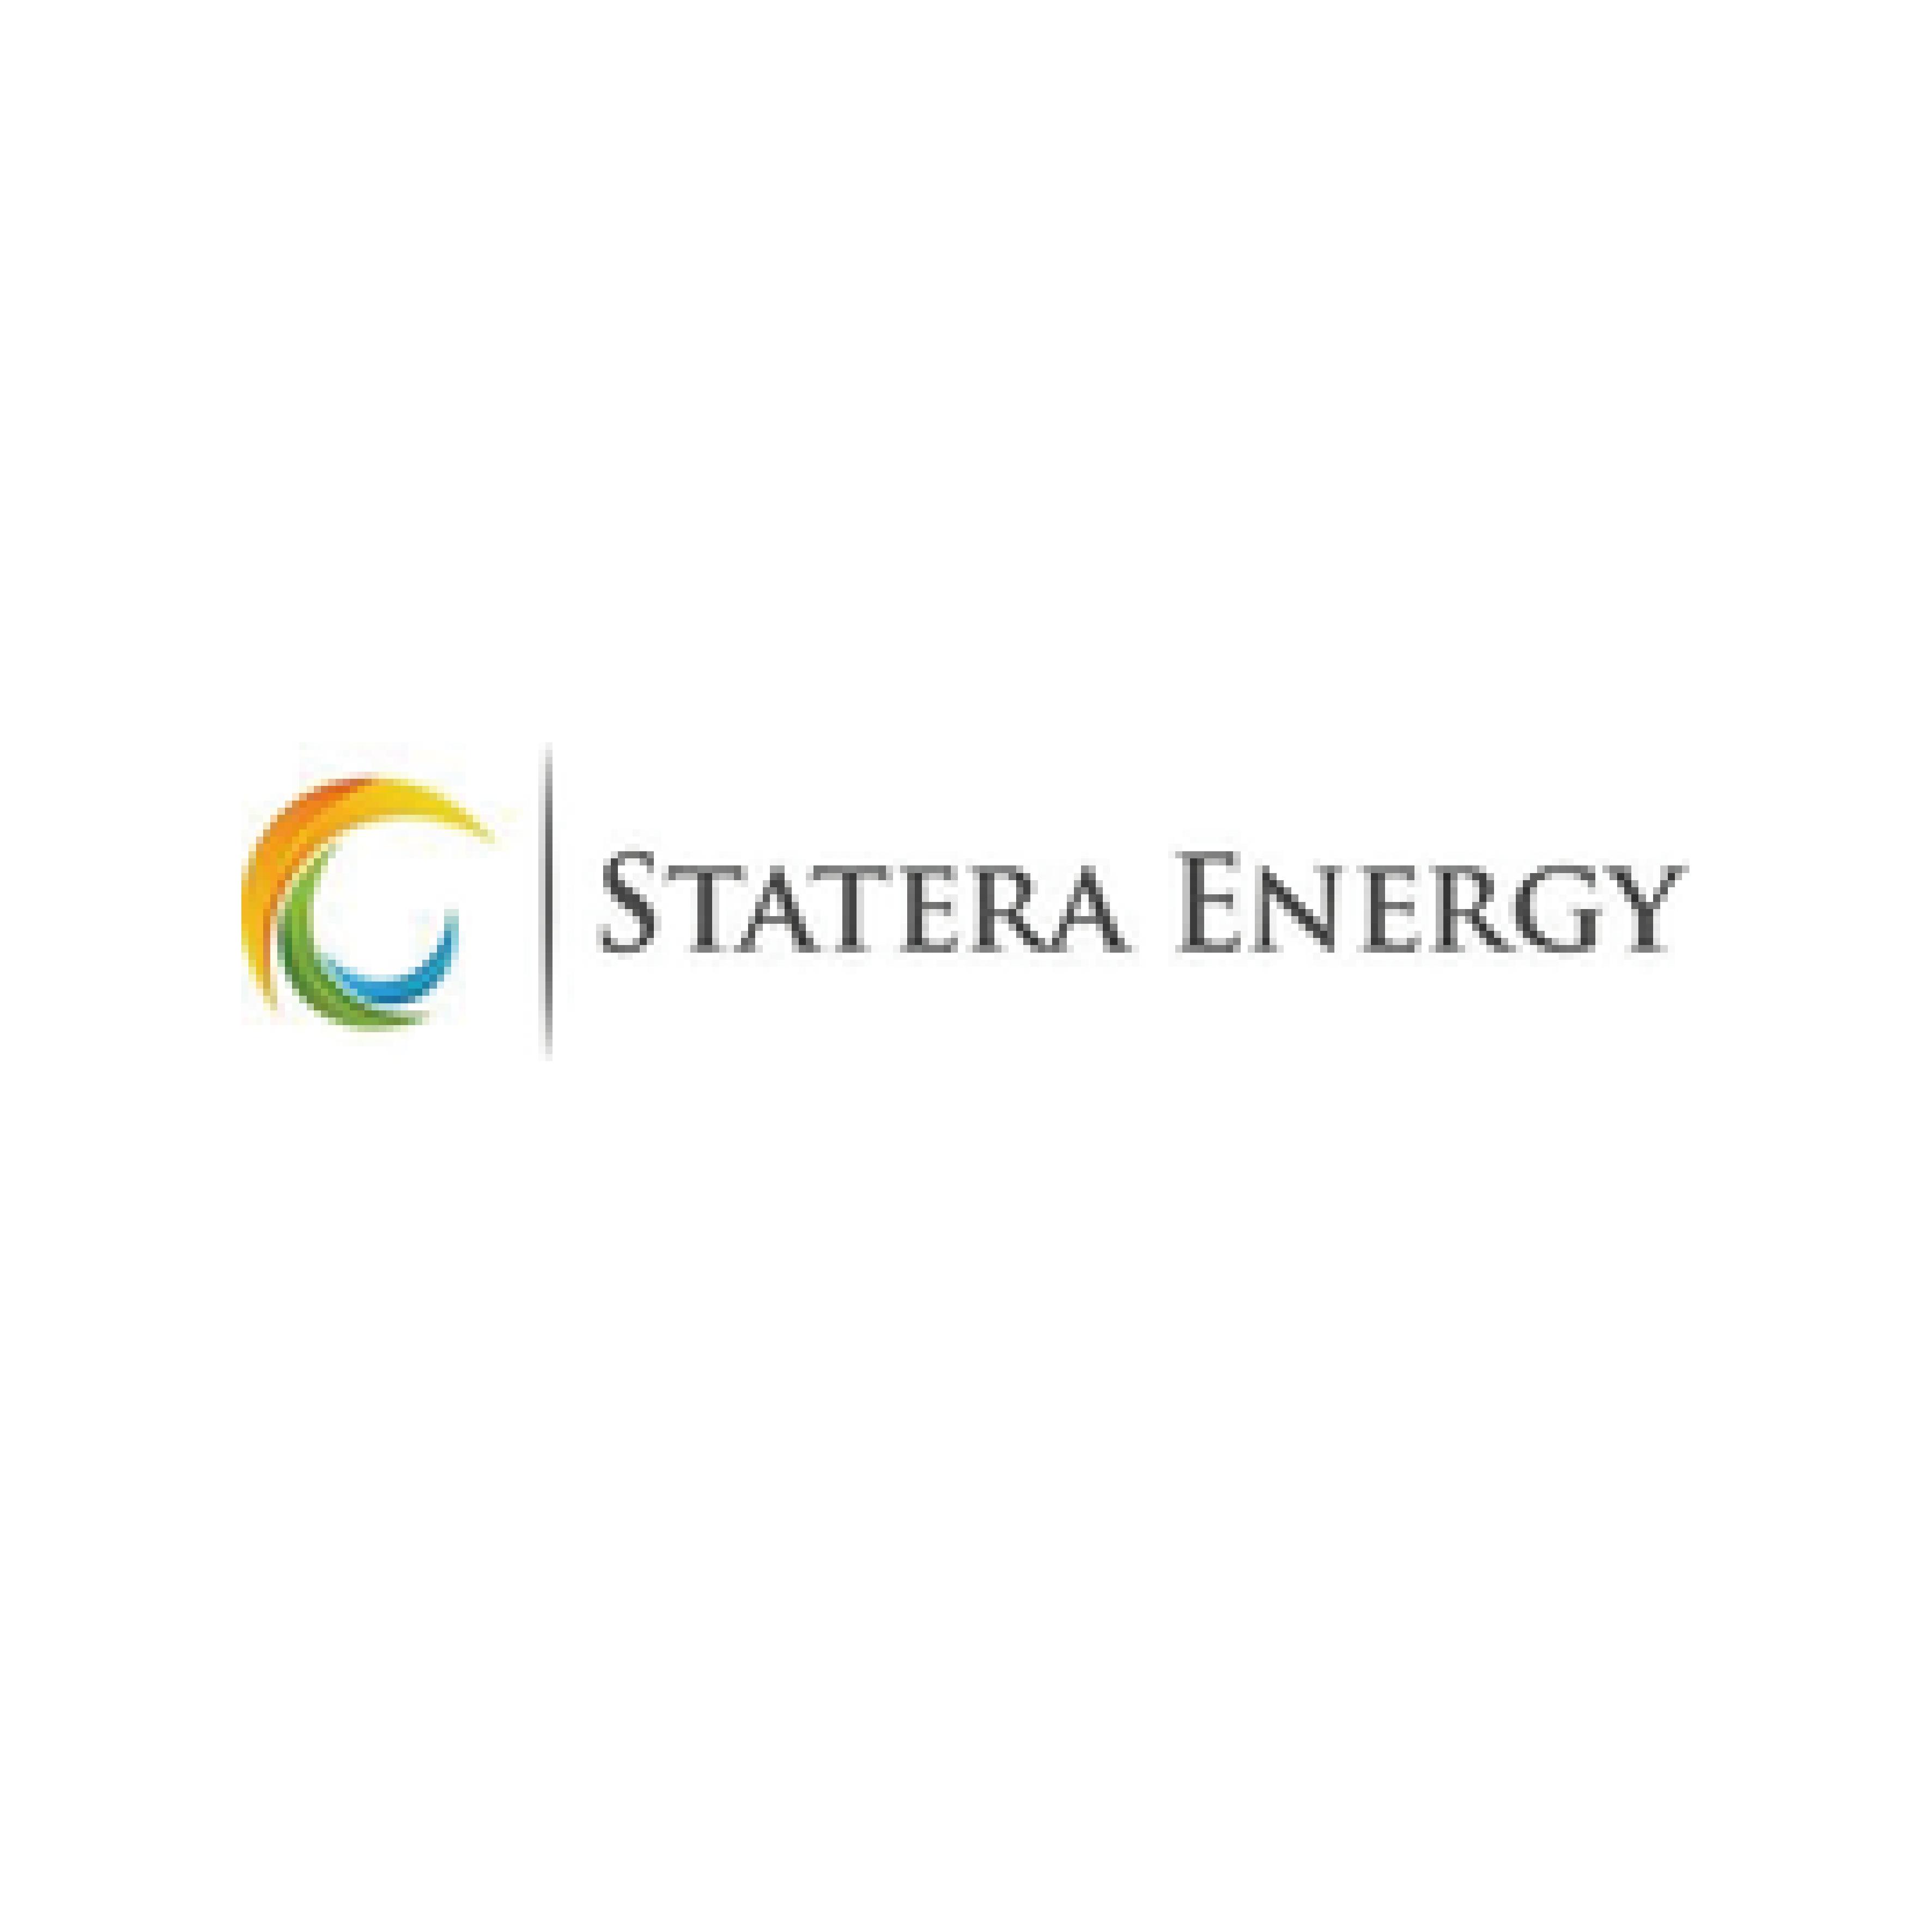 Statera Energy